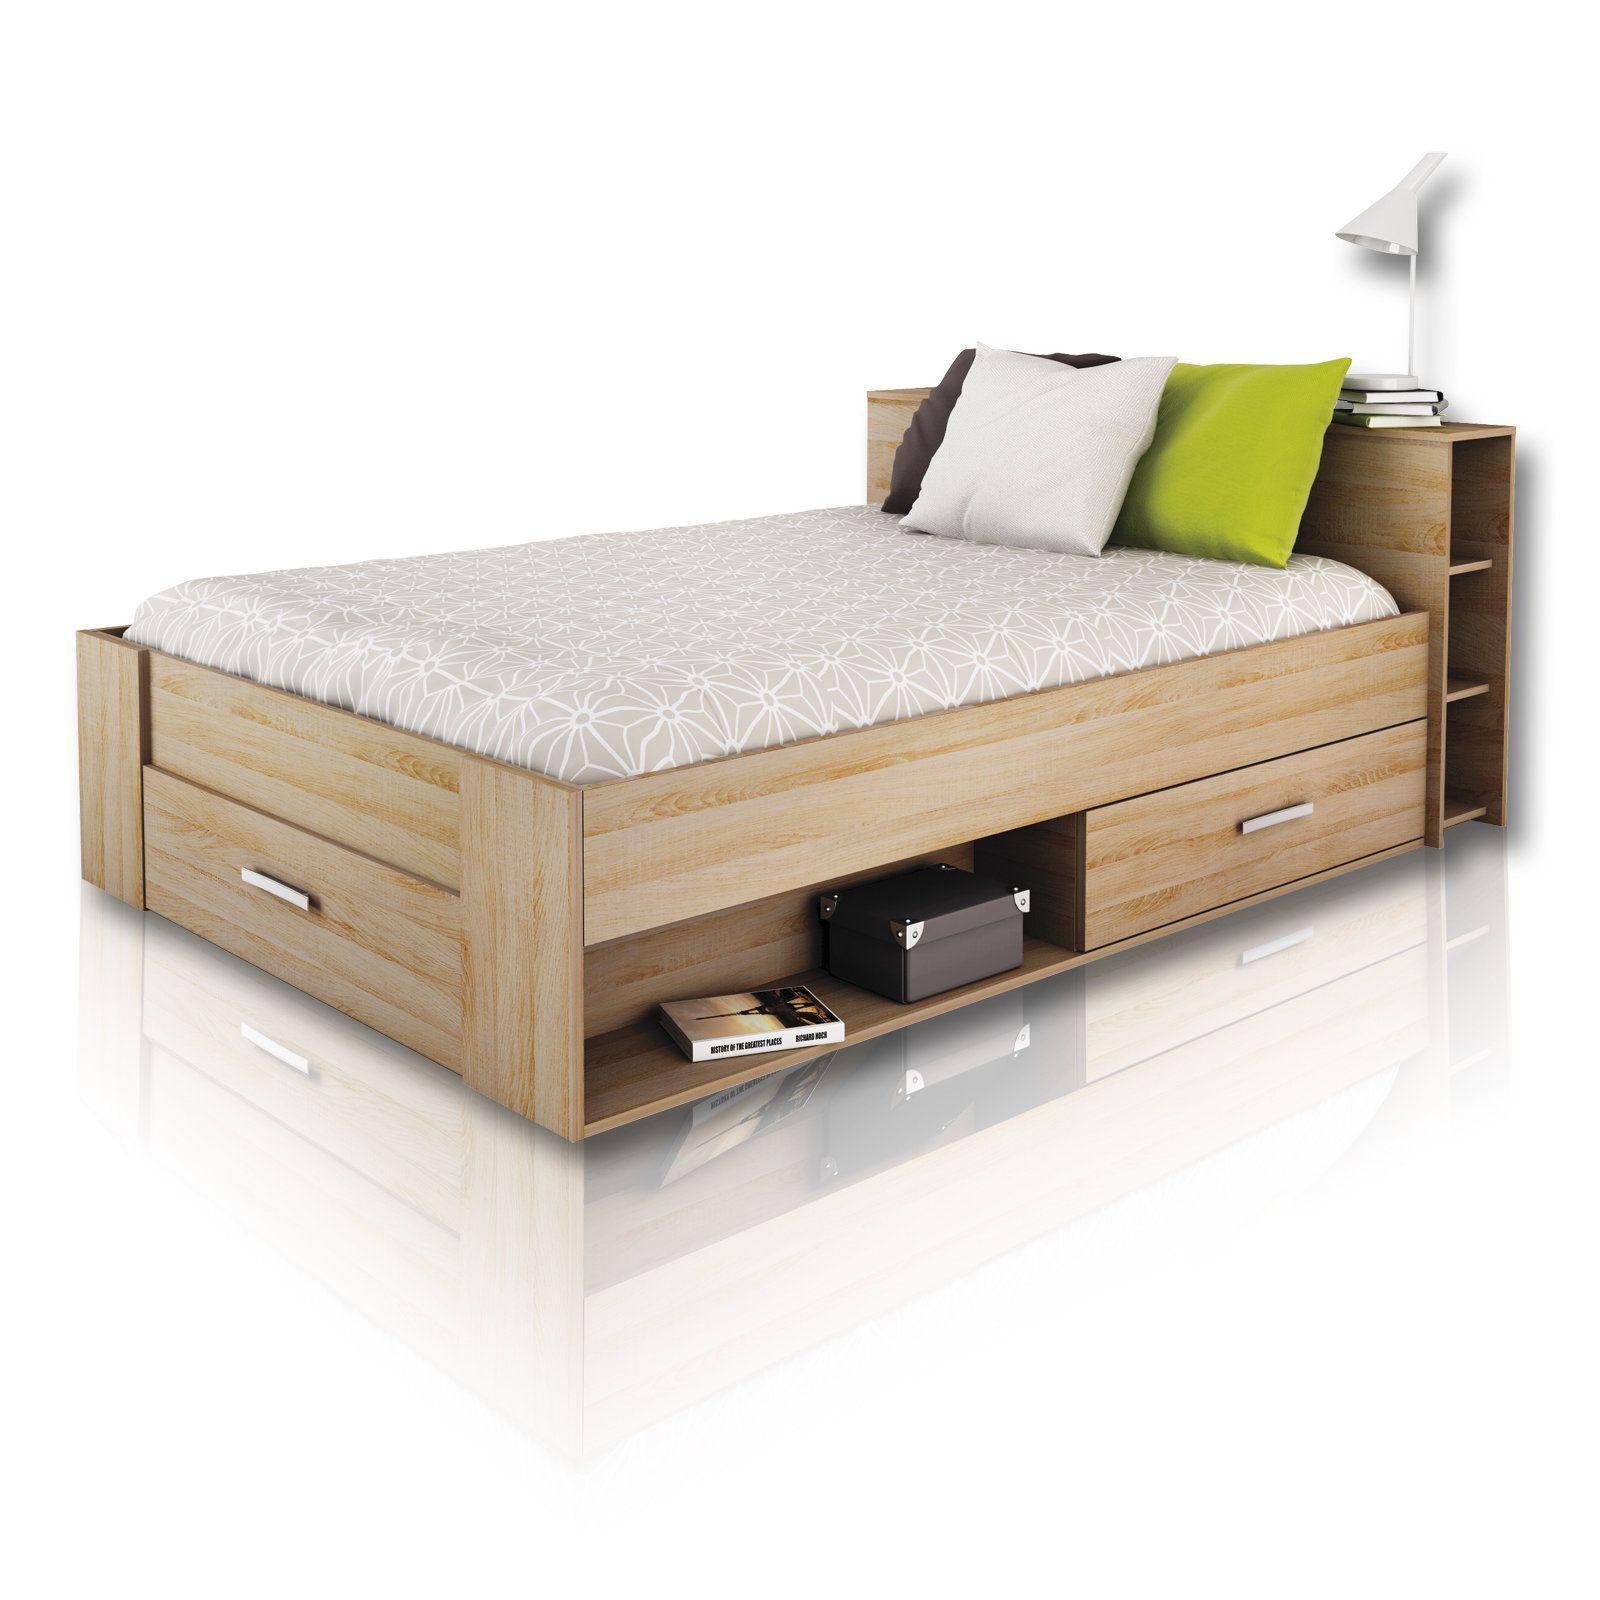 funktionsbett pocket eiche sonoma 140x200 cm pinterest bett bettgestell m bel. Black Bedroom Furniture Sets. Home Design Ideas